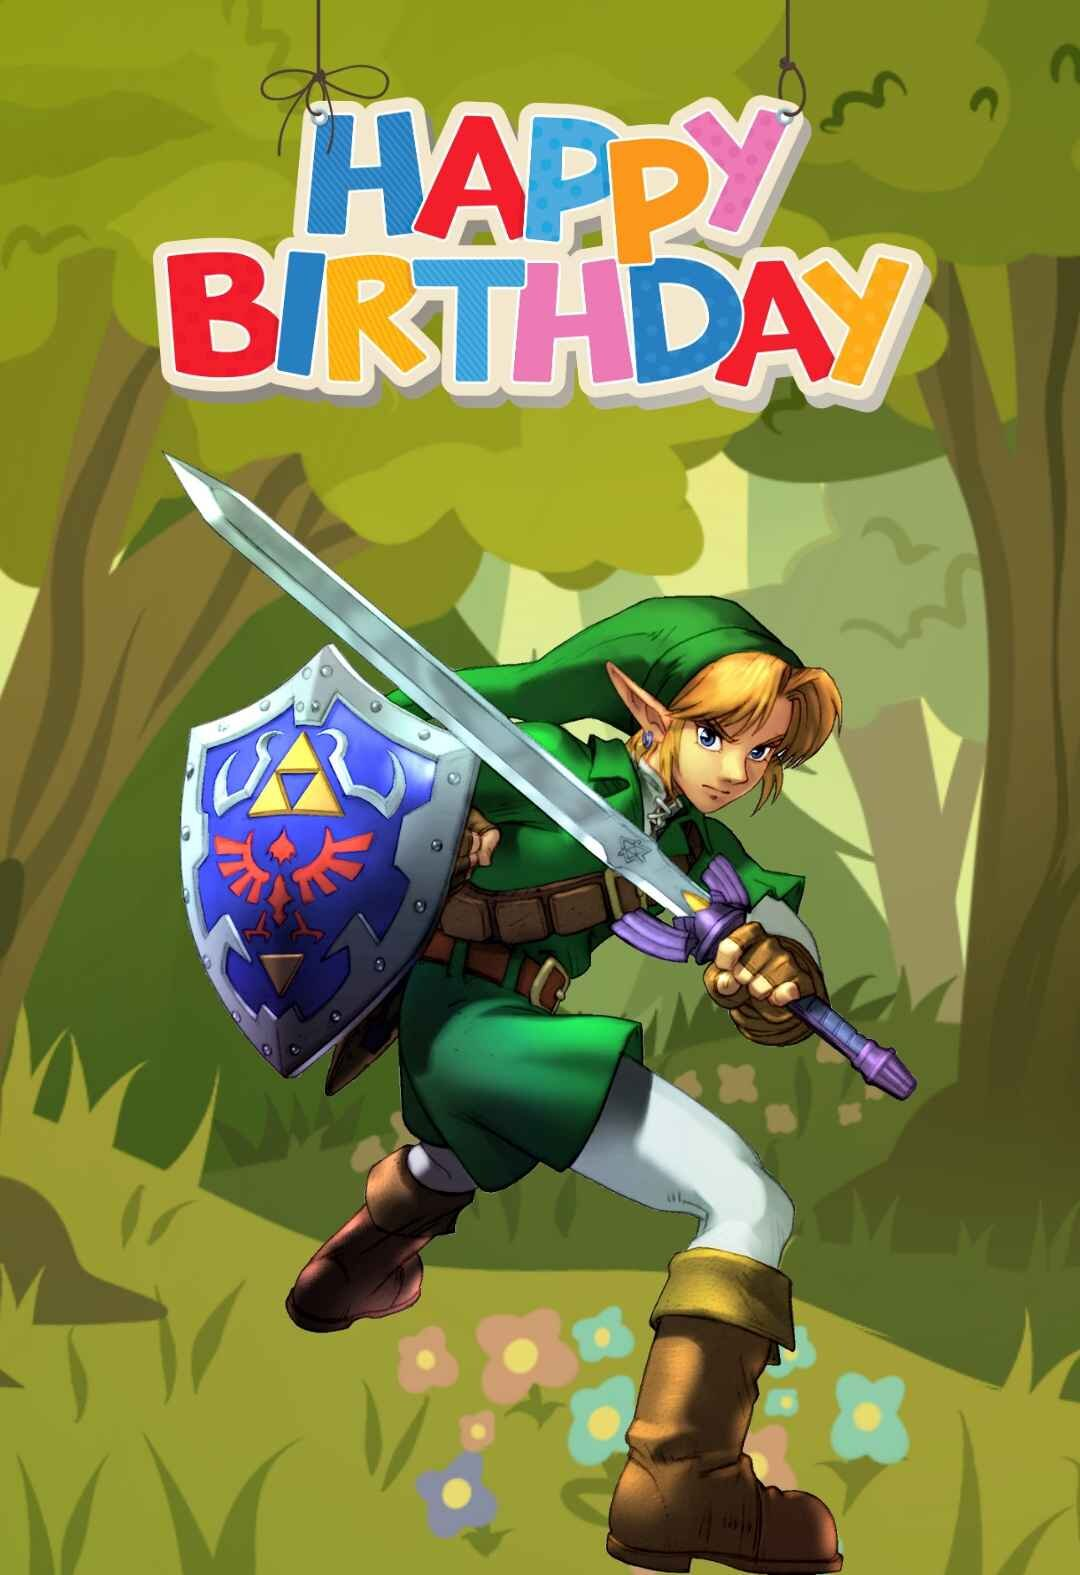 Zelda Printable Birthday Cards Printbirthday Cards